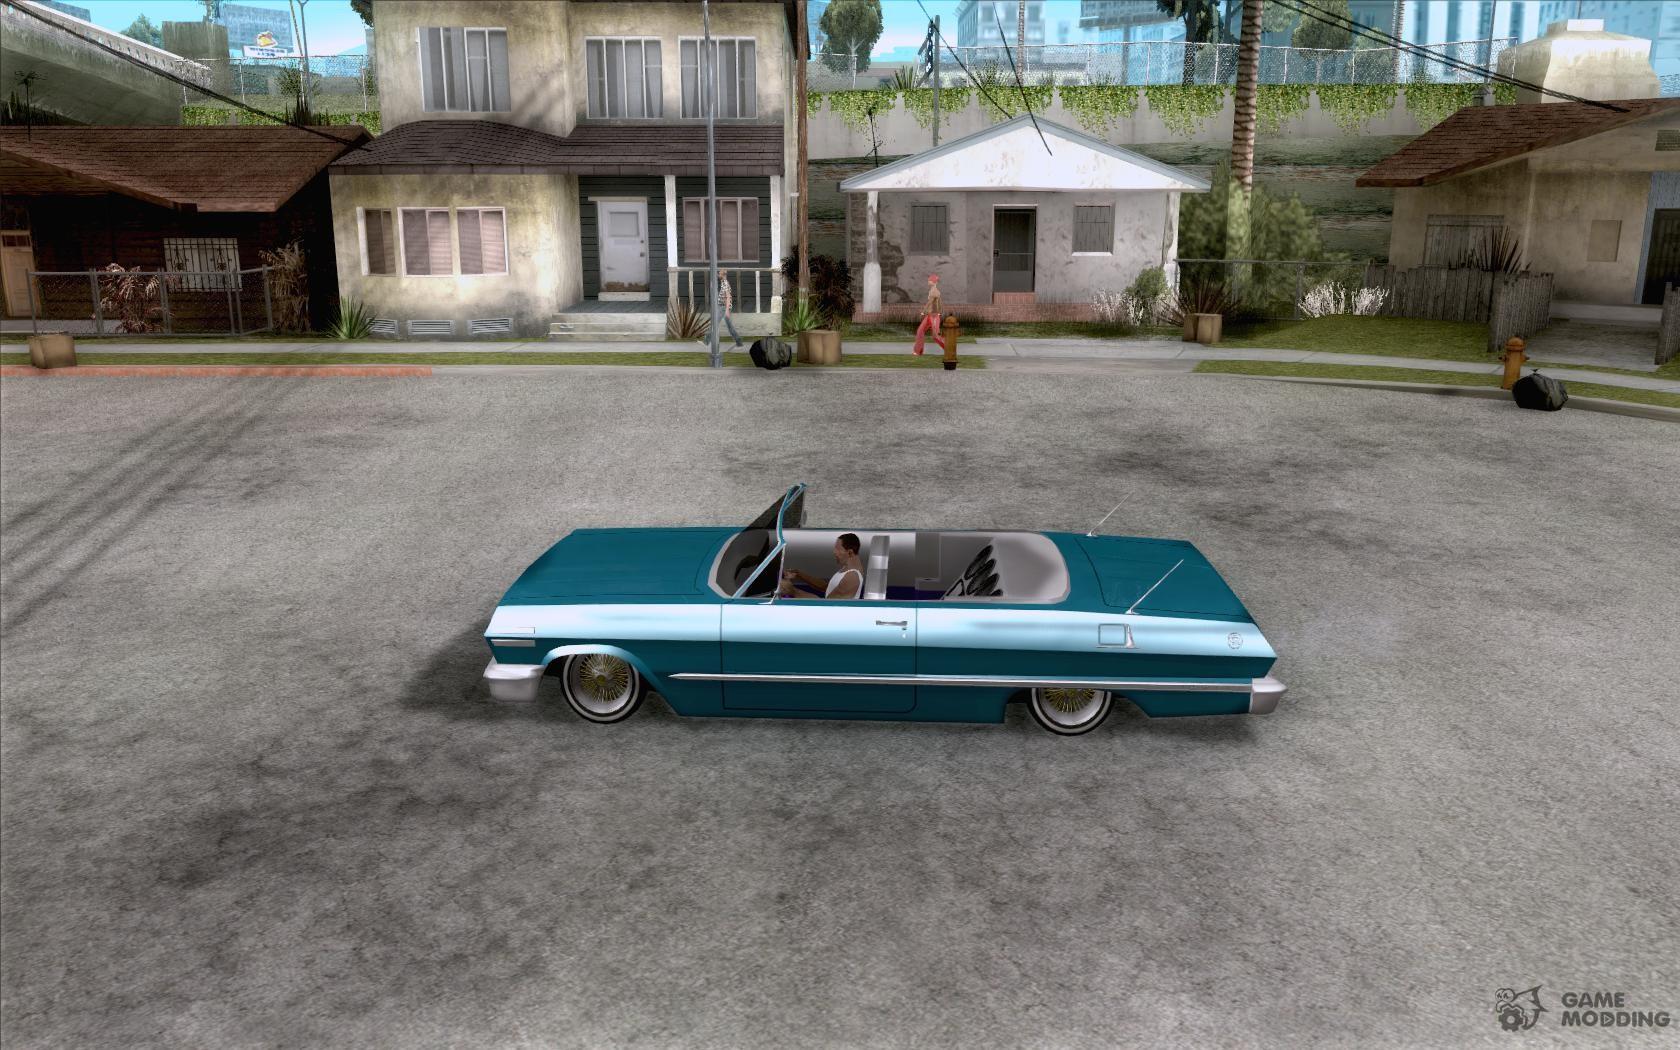 Chevrolet impala 4 door hardtop 1963 for gta san andreas - Chevrolet Impala Hardtop 1963 For Gta San Andreas Left View